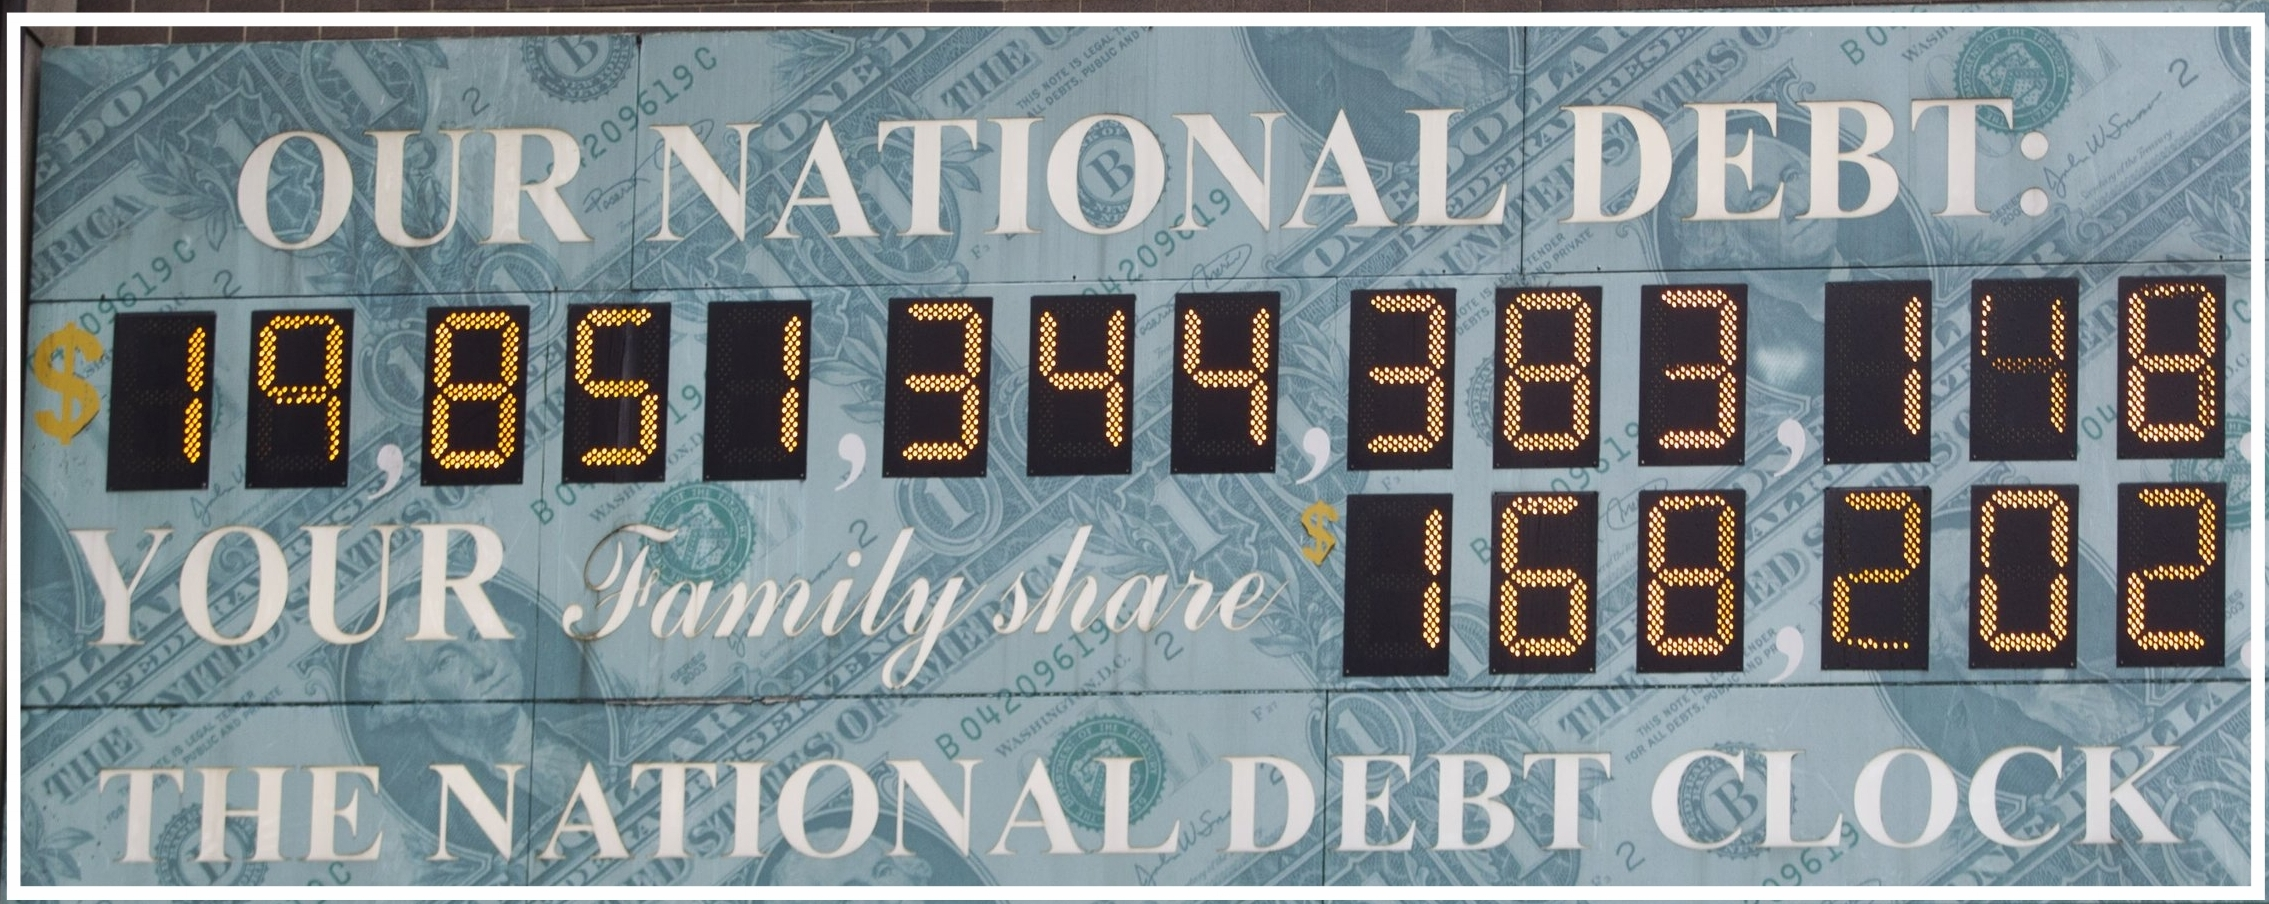 National Debt Clock.jpg